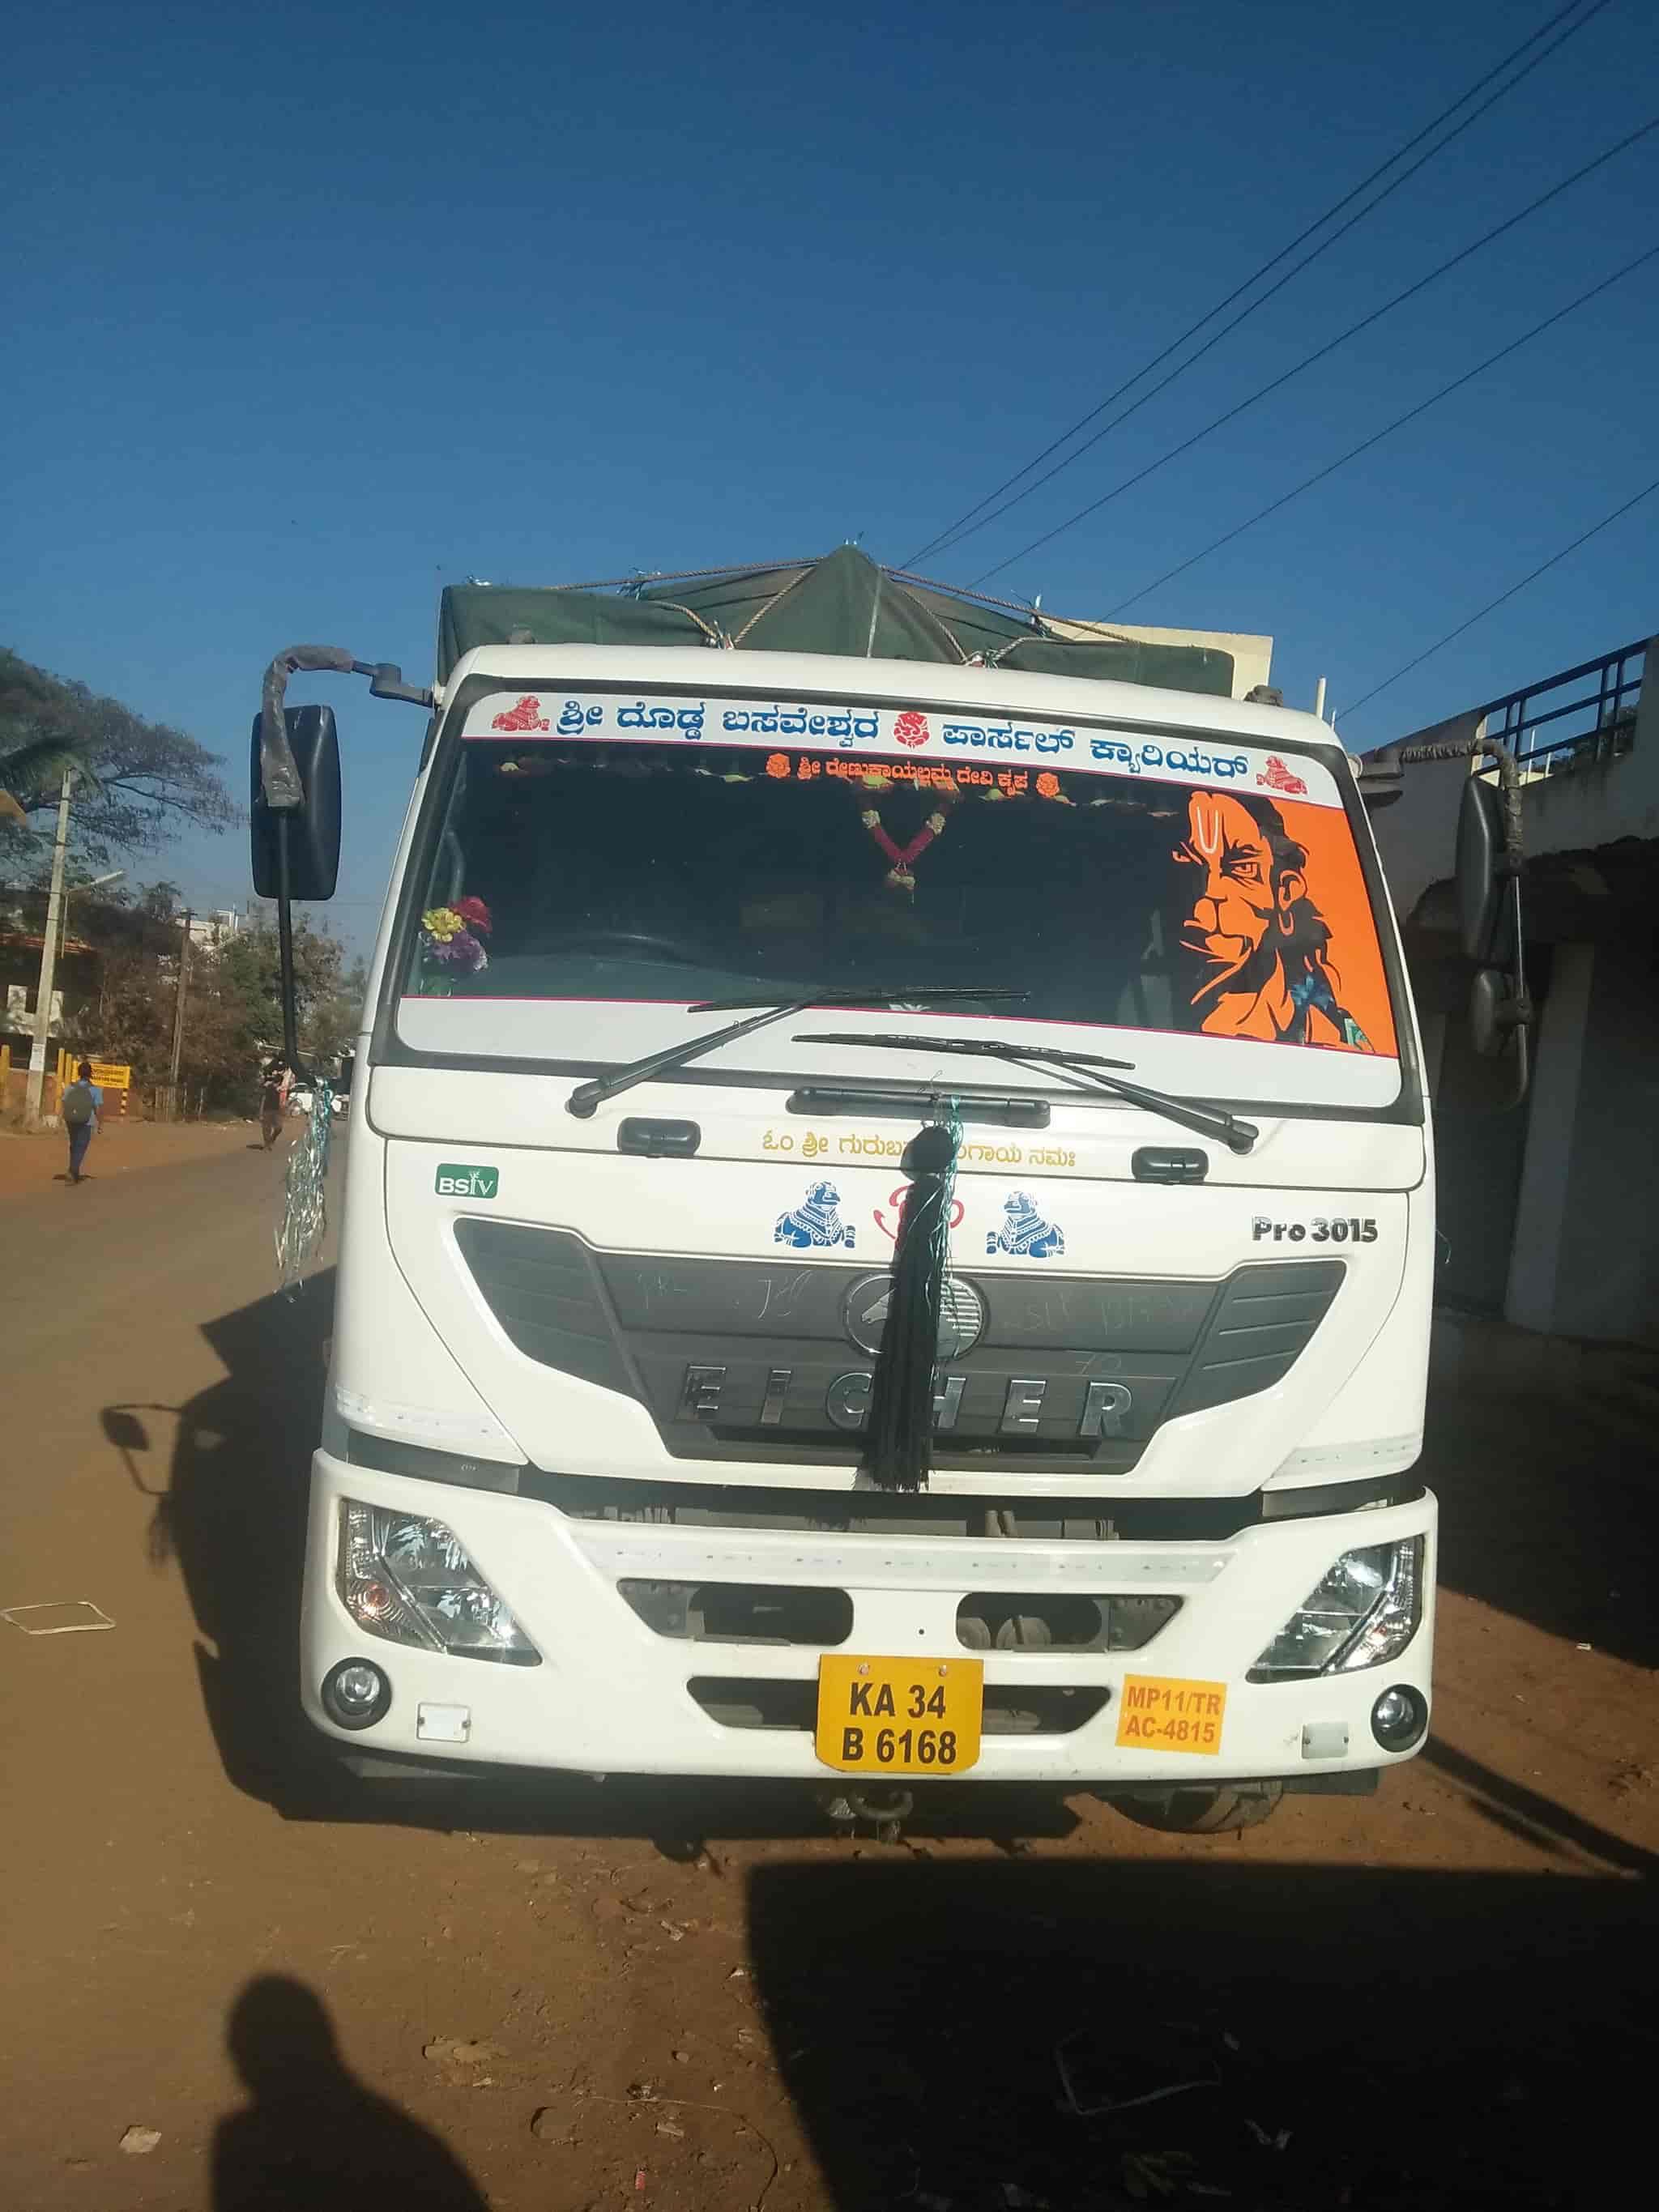 Doddabasaveswara Parcel Carriers s Gokul Road Hubli